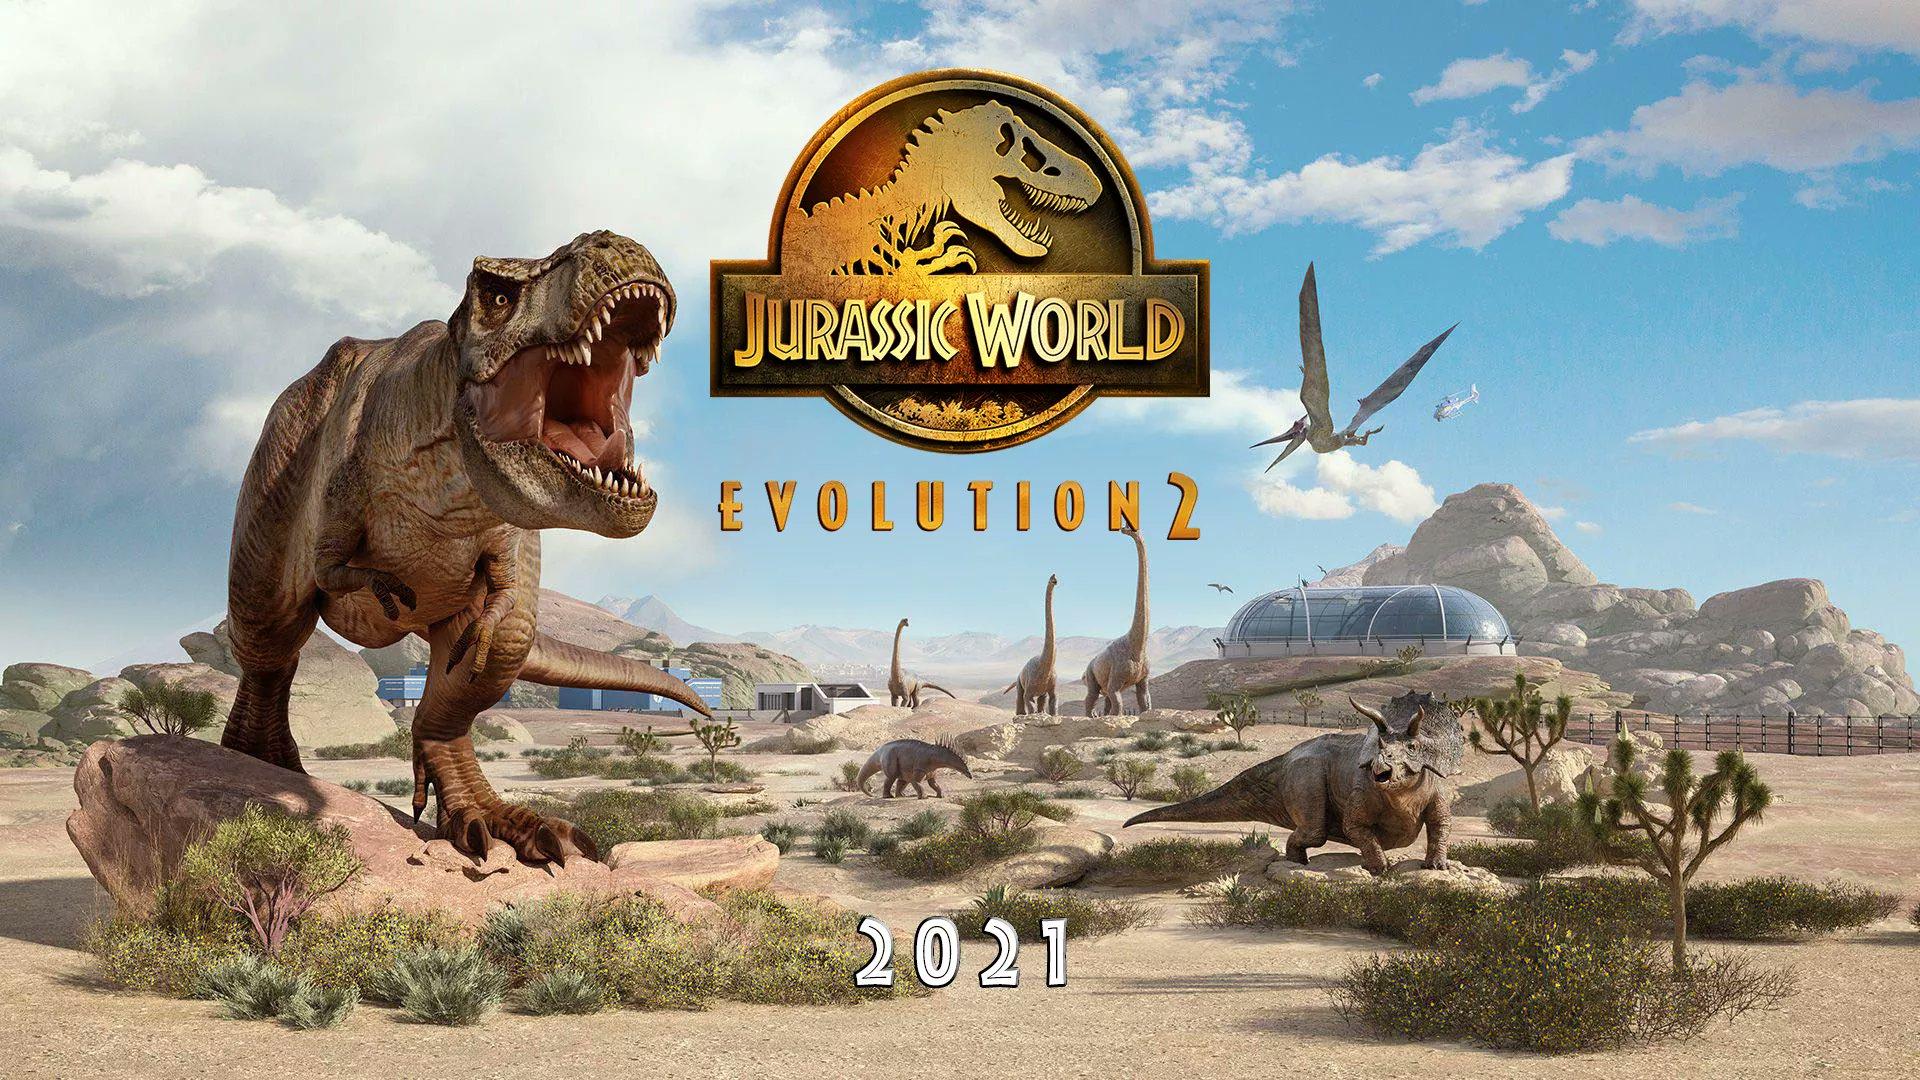 Jurassic World Evolution 2, GamersRD